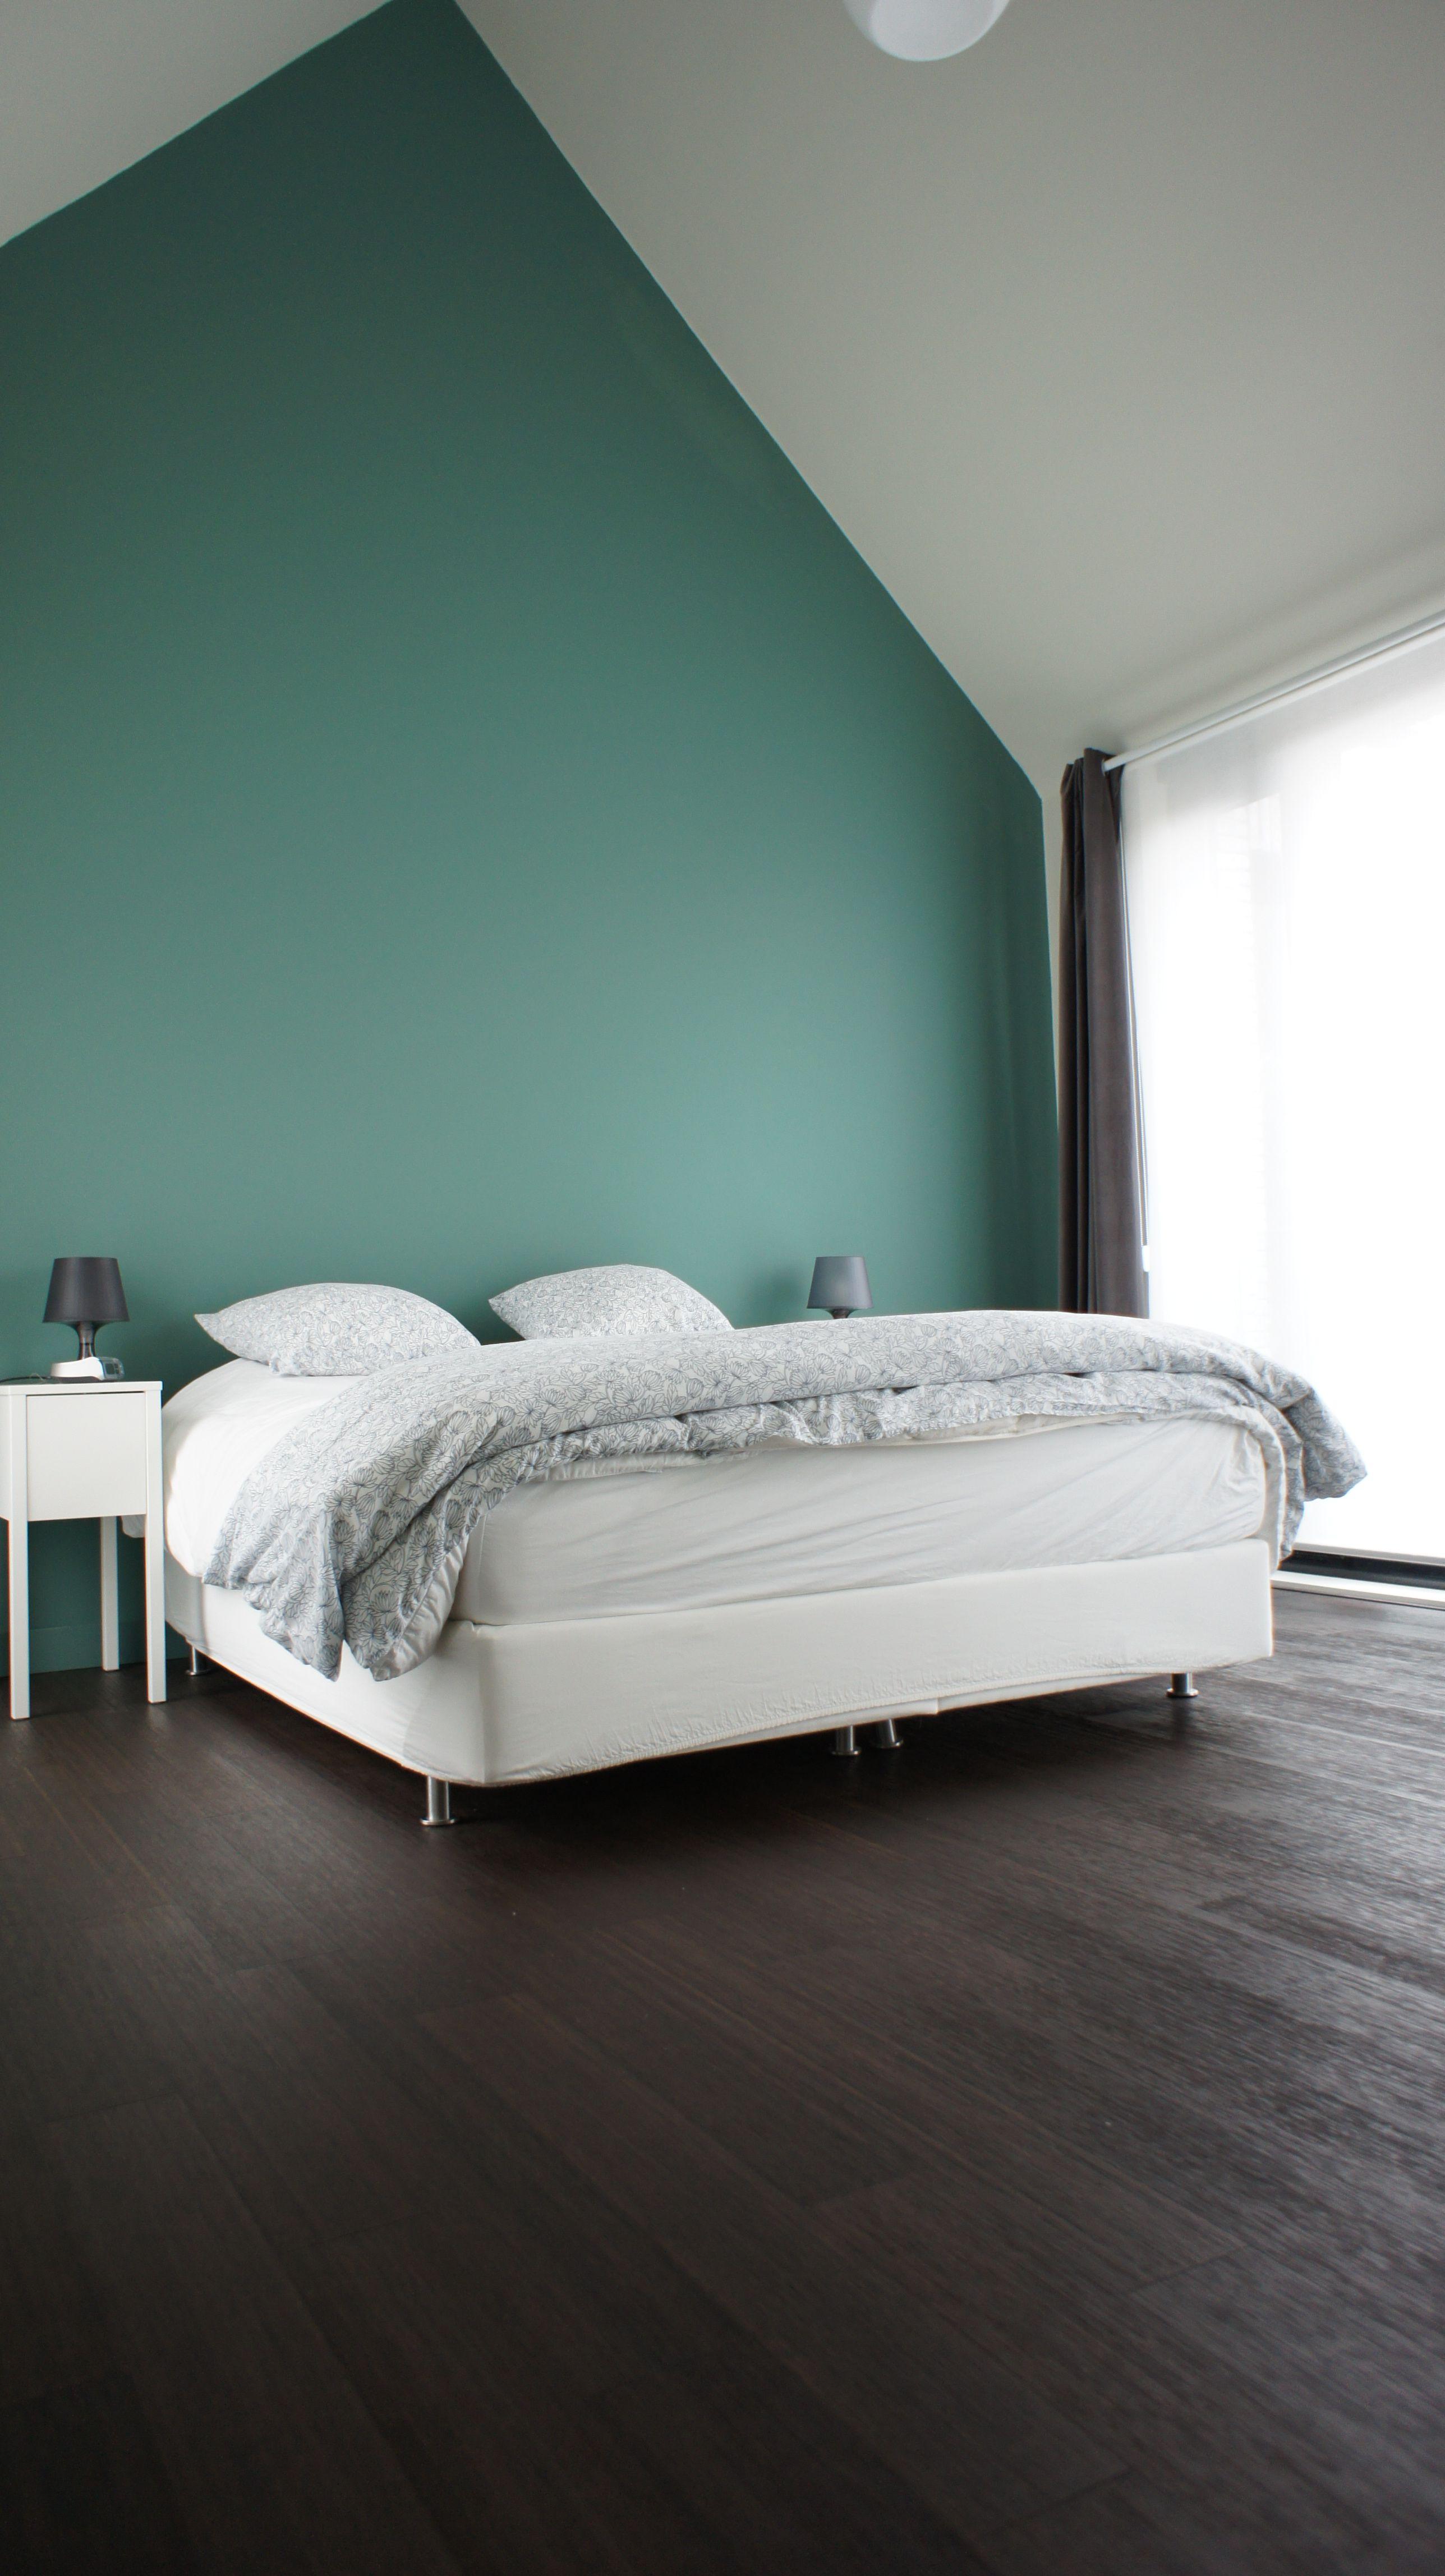 Top Bamboe vloer in slaapkamer Loft woning  Binnenhuis